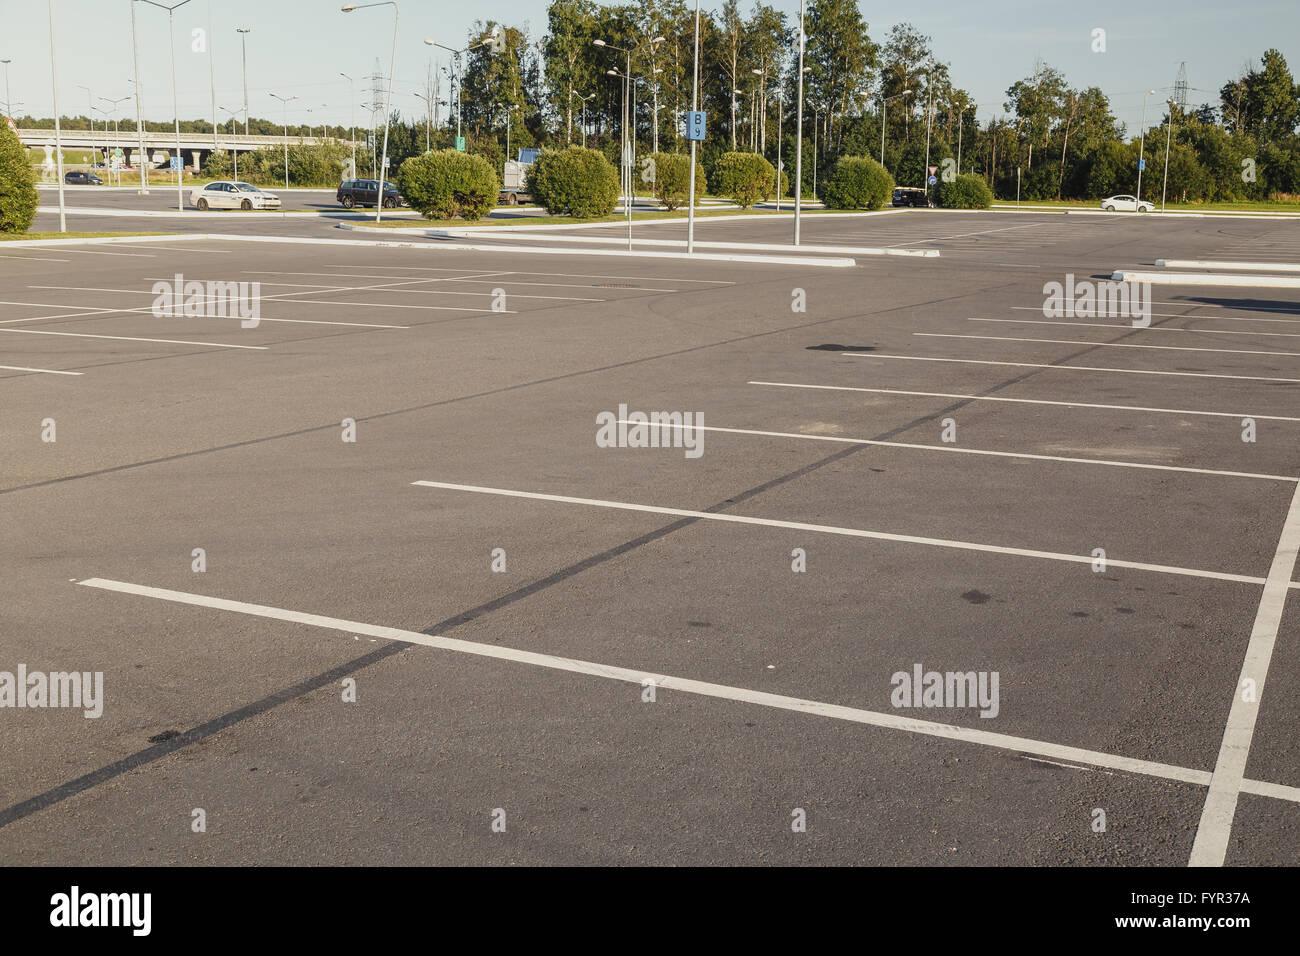 Empty parking lot area - Stock Image